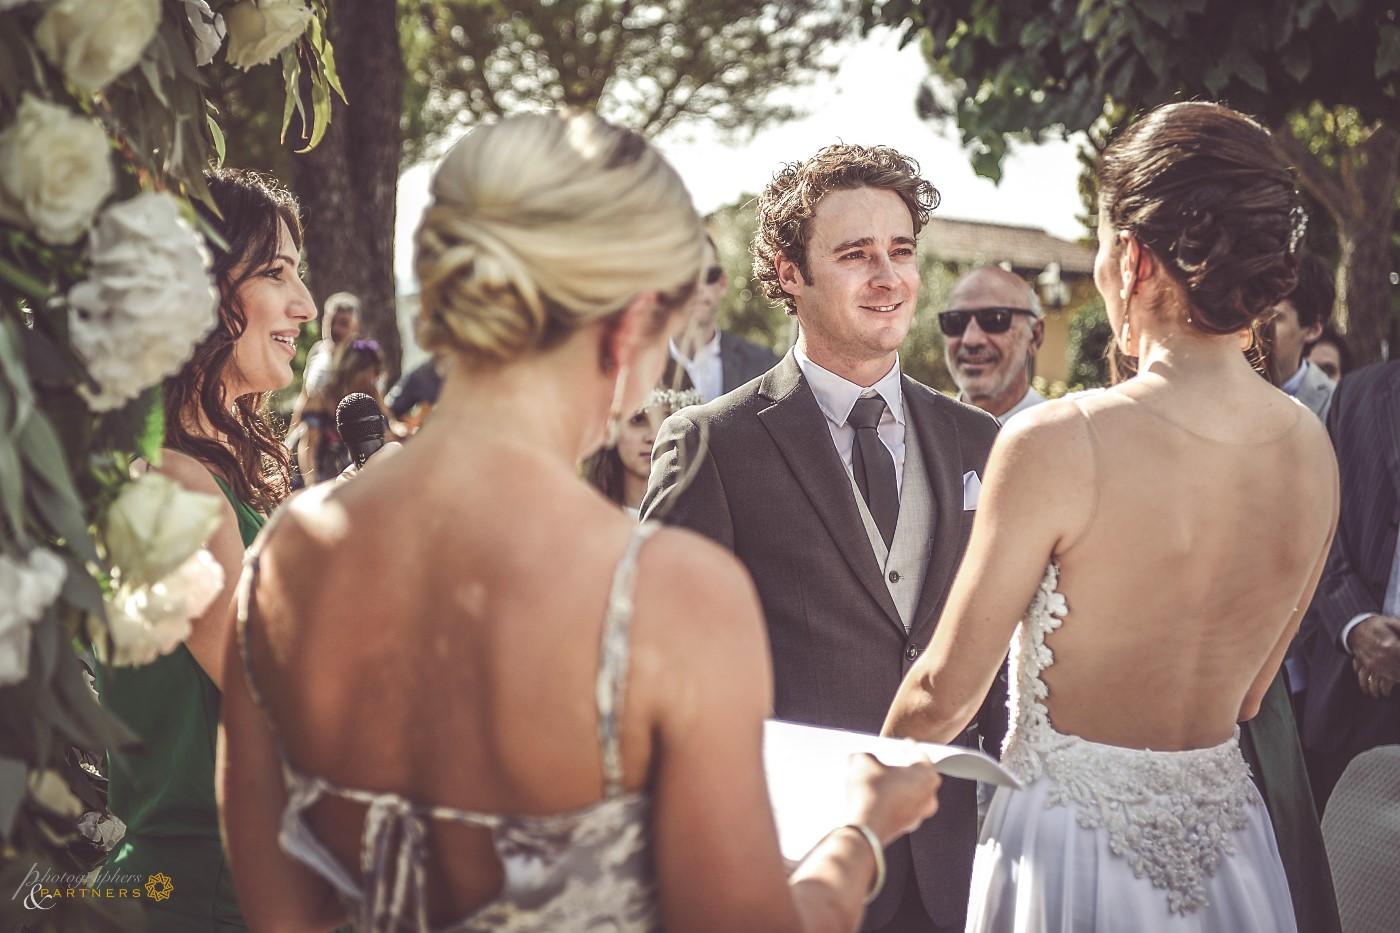 photographer_weddings_montepulciano_06.jpg